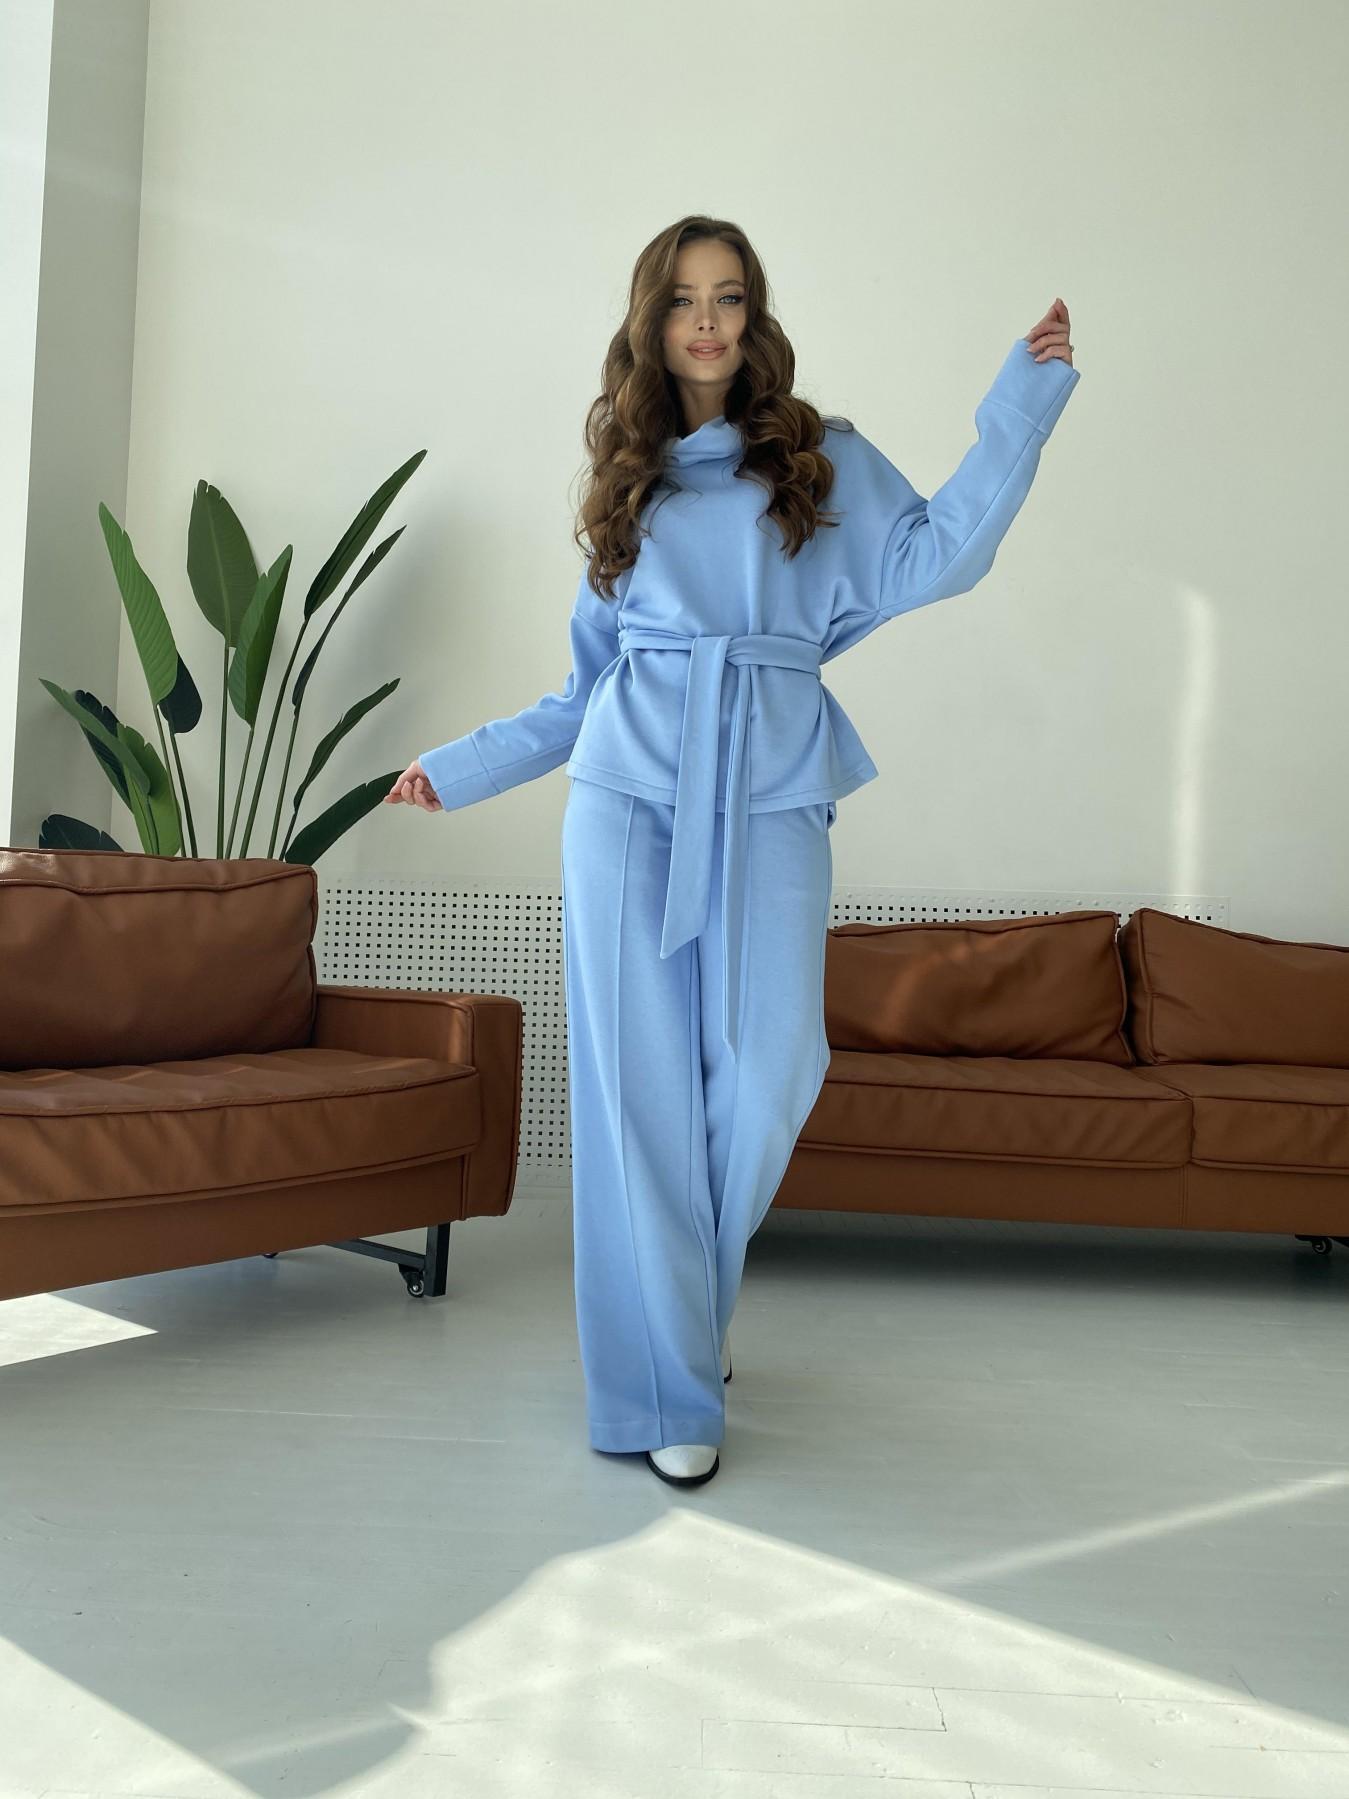 Джаст костюм Oversize  3х нитка 10564 АРТ. 47245 Цвет: Голубой - фото 2, интернет магазин tm-modus.ru